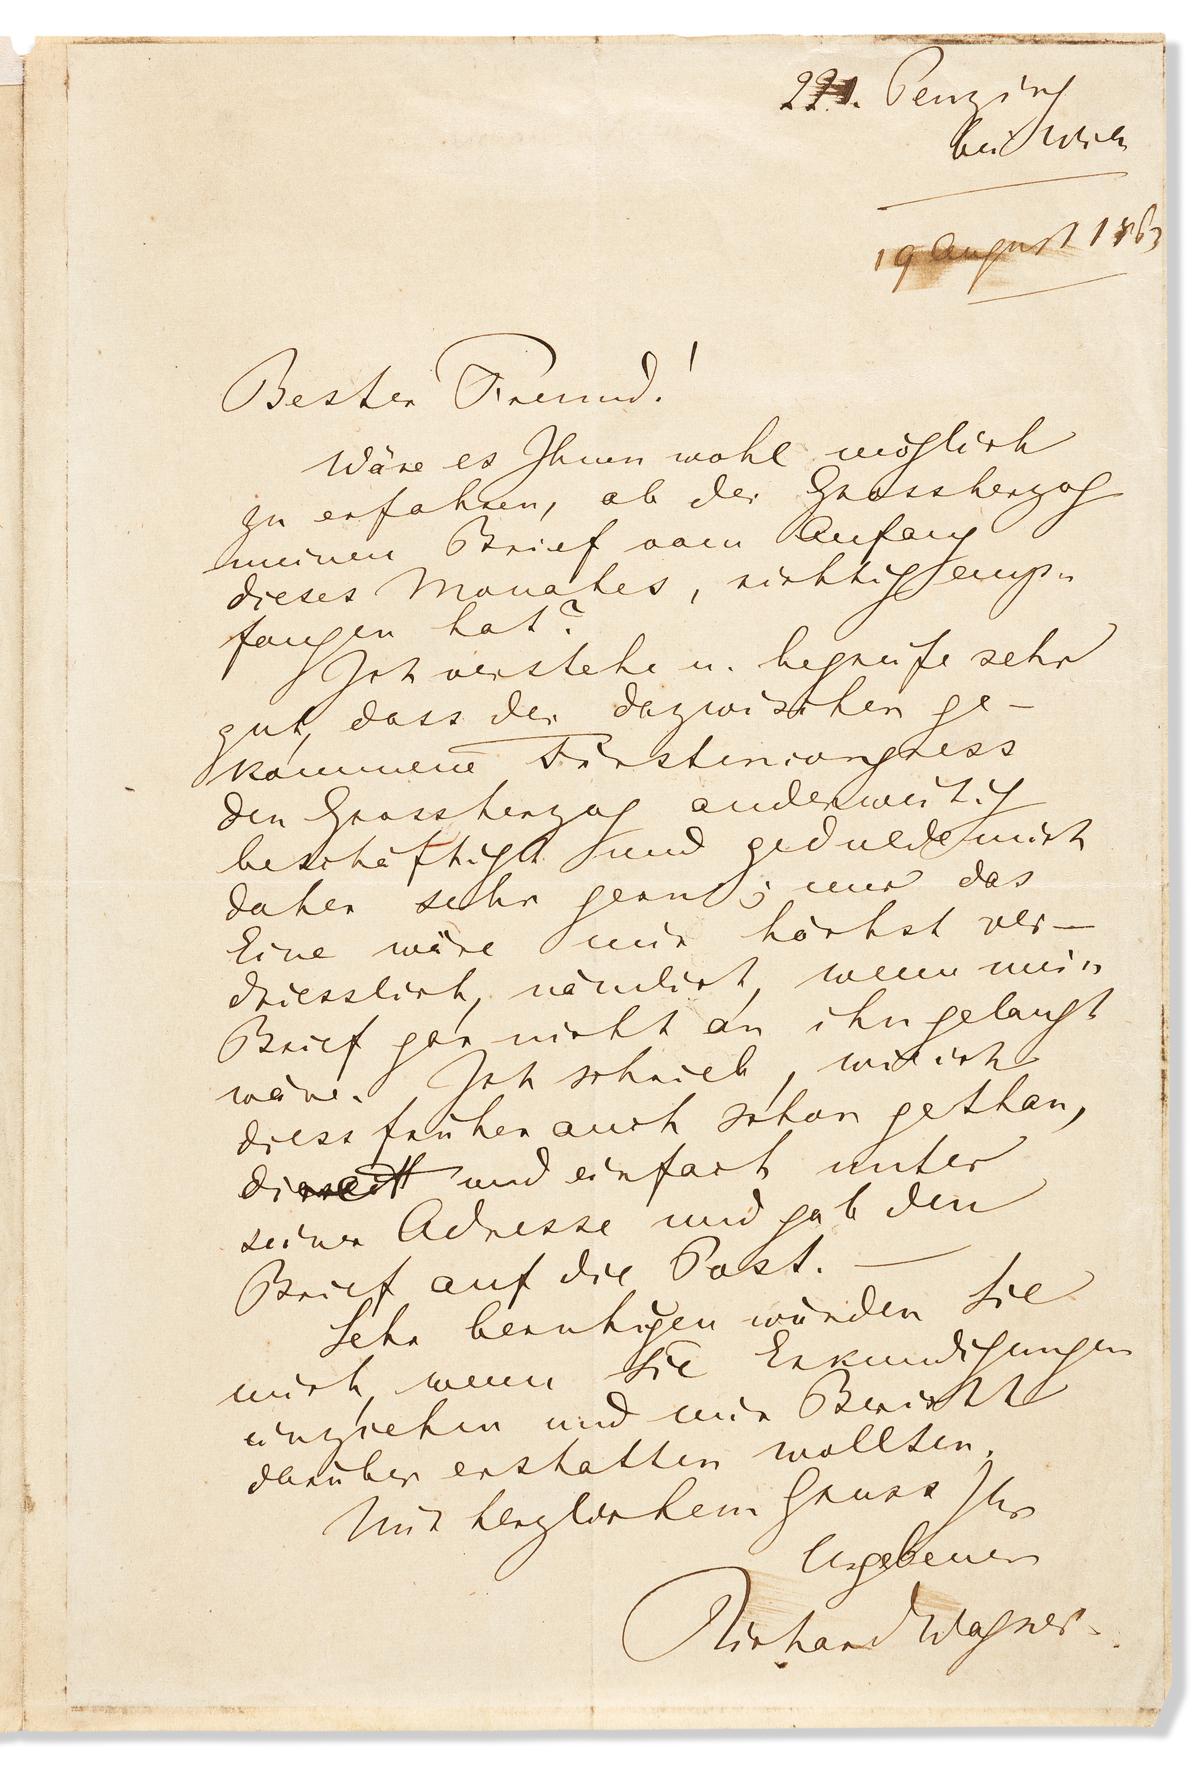 WAGNER, RICHARD. Autograph Letter Signed, to Dearest friend, in German,